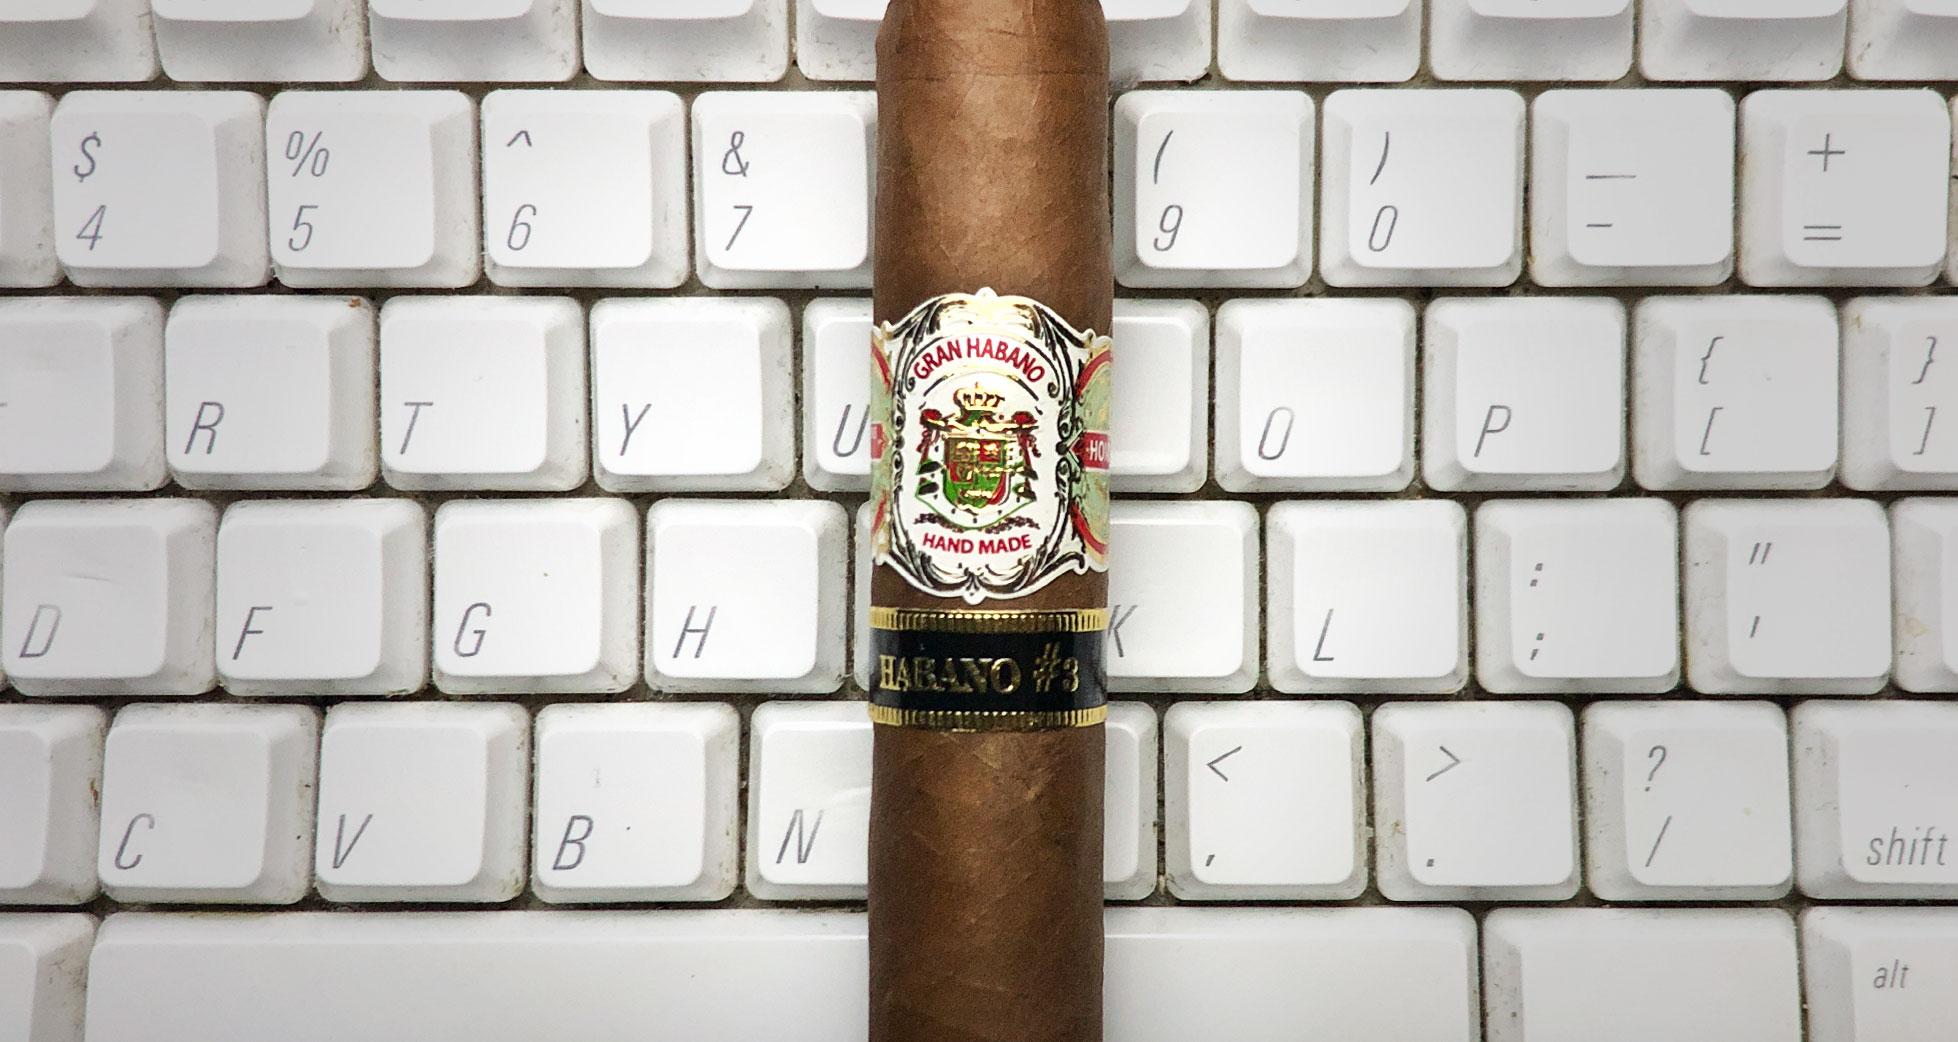 Gran Habano Habano #3, Robusto, Gran Habano, Nicaraguan Habano, Honduras